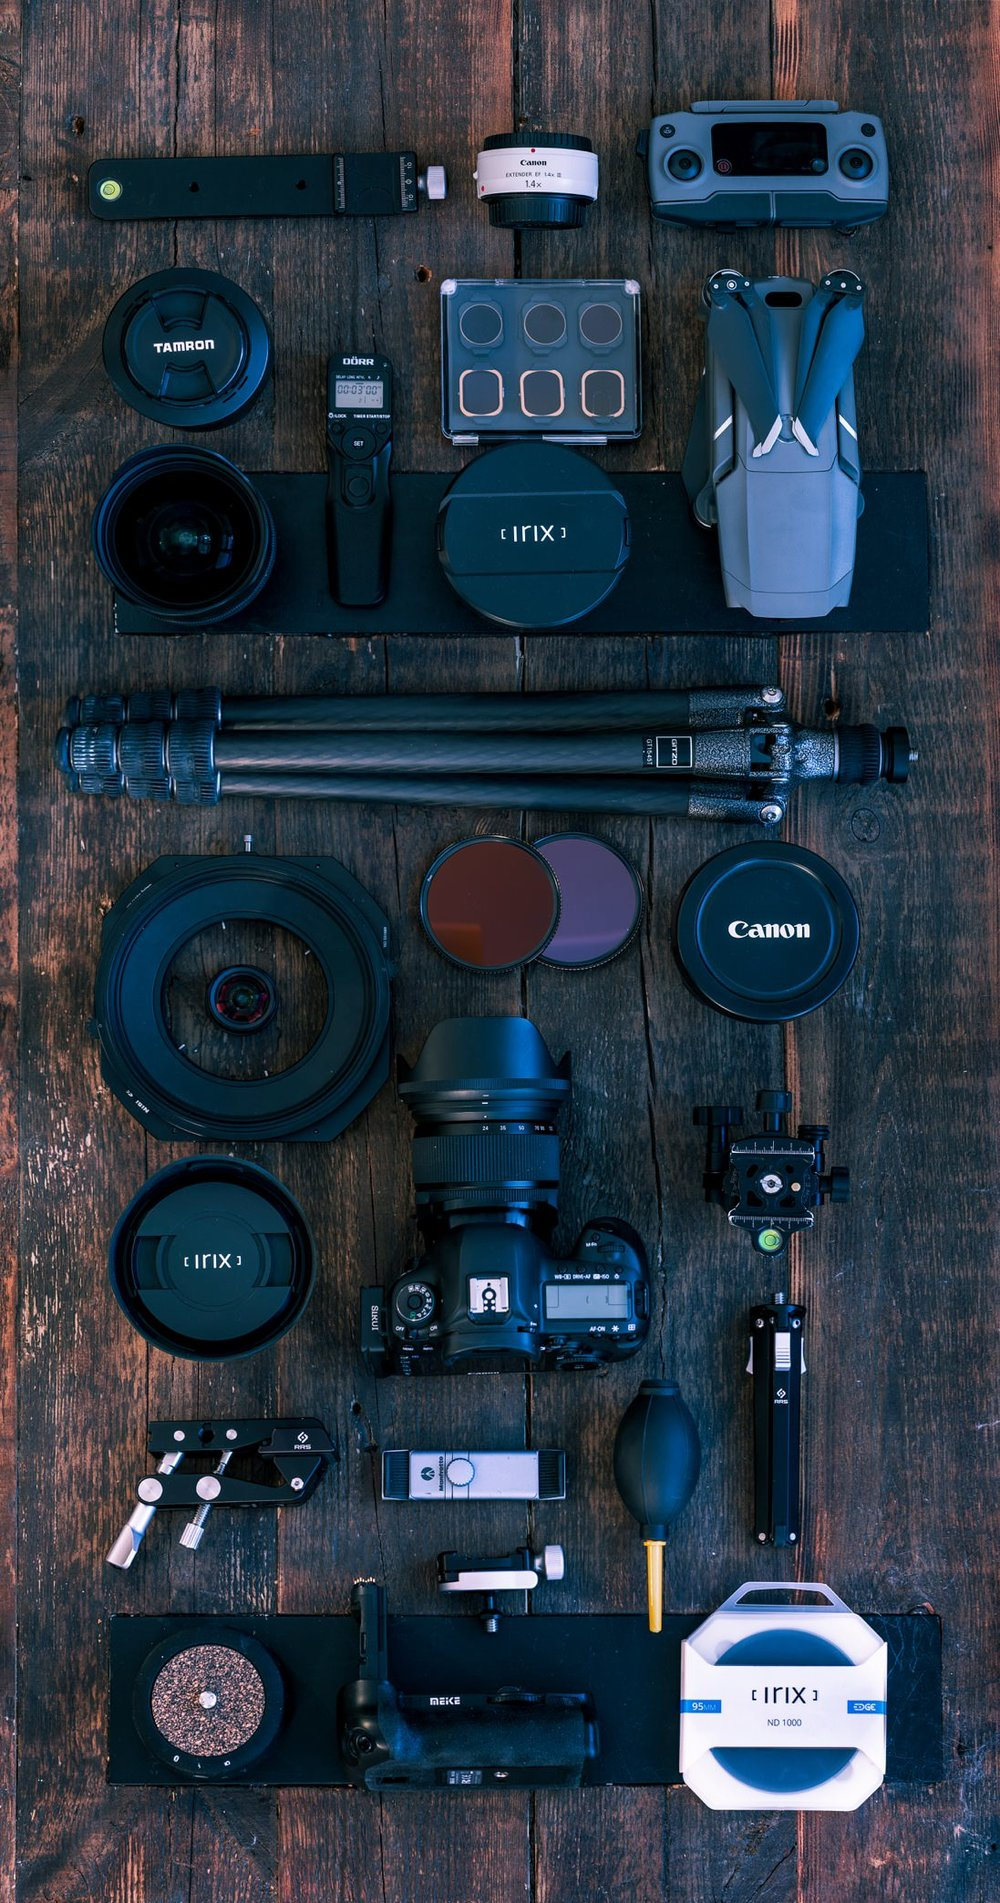 Equipments - • Canon 5D Mark IV• Canon TS-E 17mm f4 Tilt Shift• DJI Mavic Pro II• Canon EOS M6• Irix 11m f4• Sigma 14-24mm f2.8• Irix 15mm f5• Sigma 24-105mm f4.0• Sigma 50mm f2.8 macro• Tamron 70-300mm f4.0• Syrp Genie Mini• Canon 1.4 Extender• Gitzo and Induro tripods with AcraTech GPSS ballhead